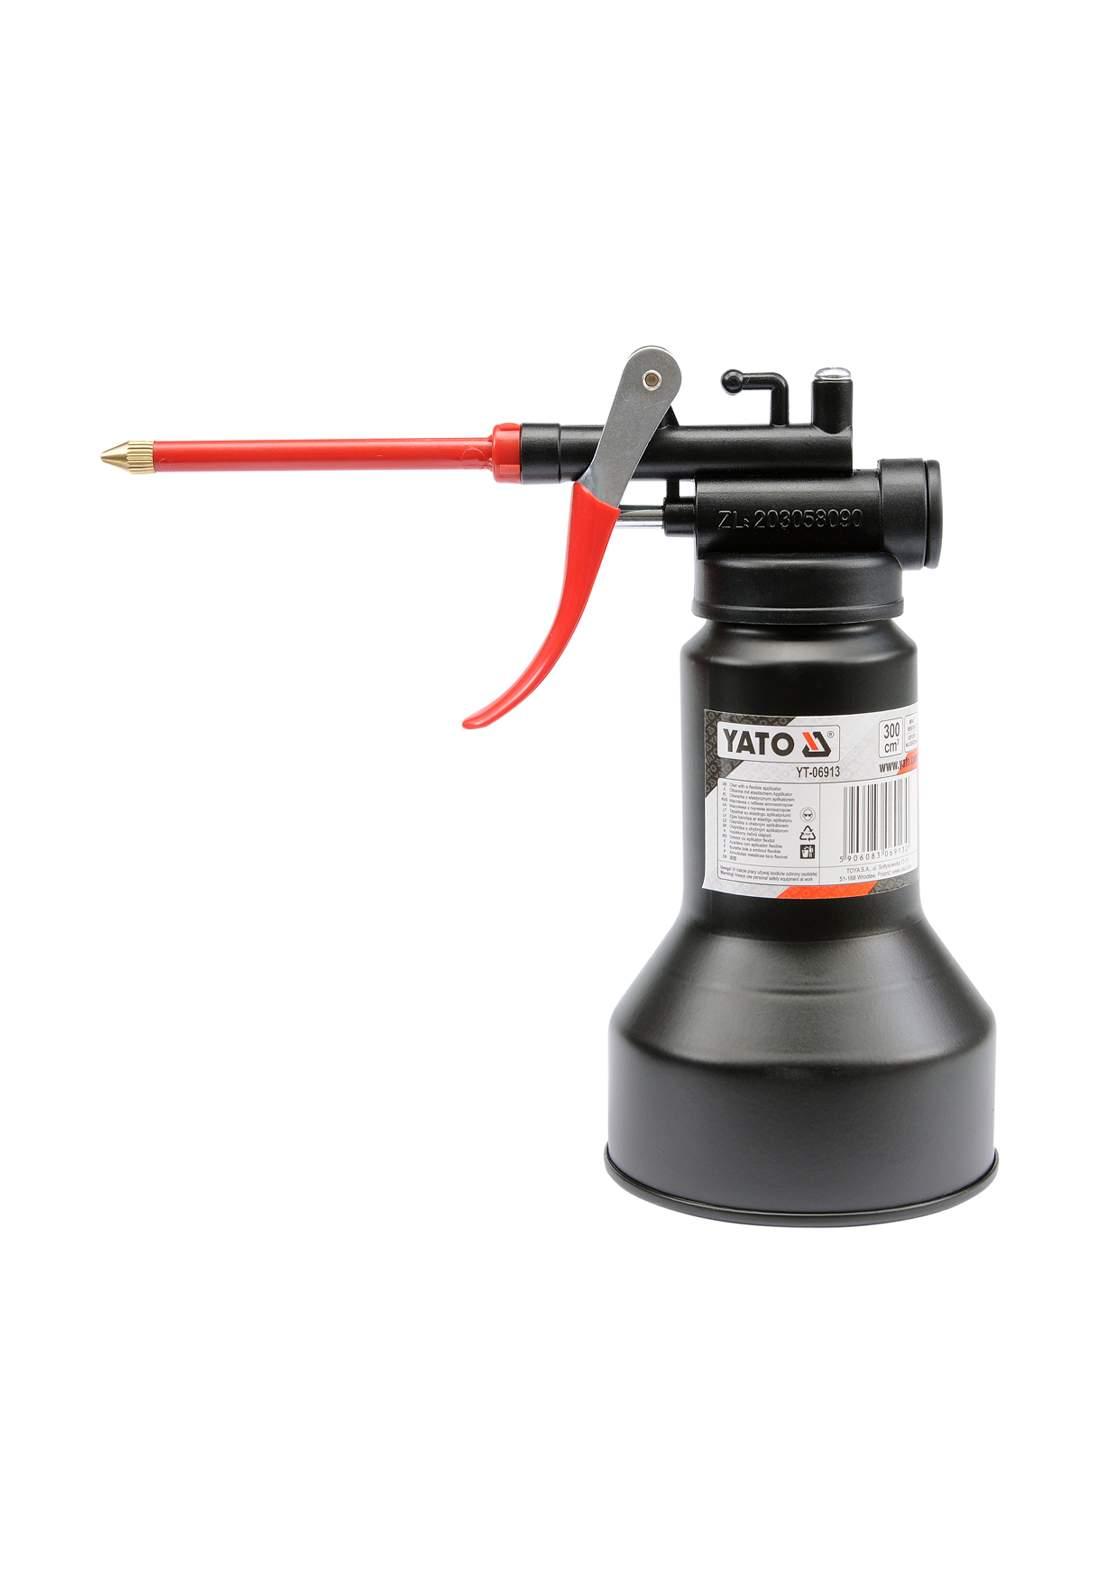 Yato Yt-06913 Oiler Tool 300 ml مسدس تزييت